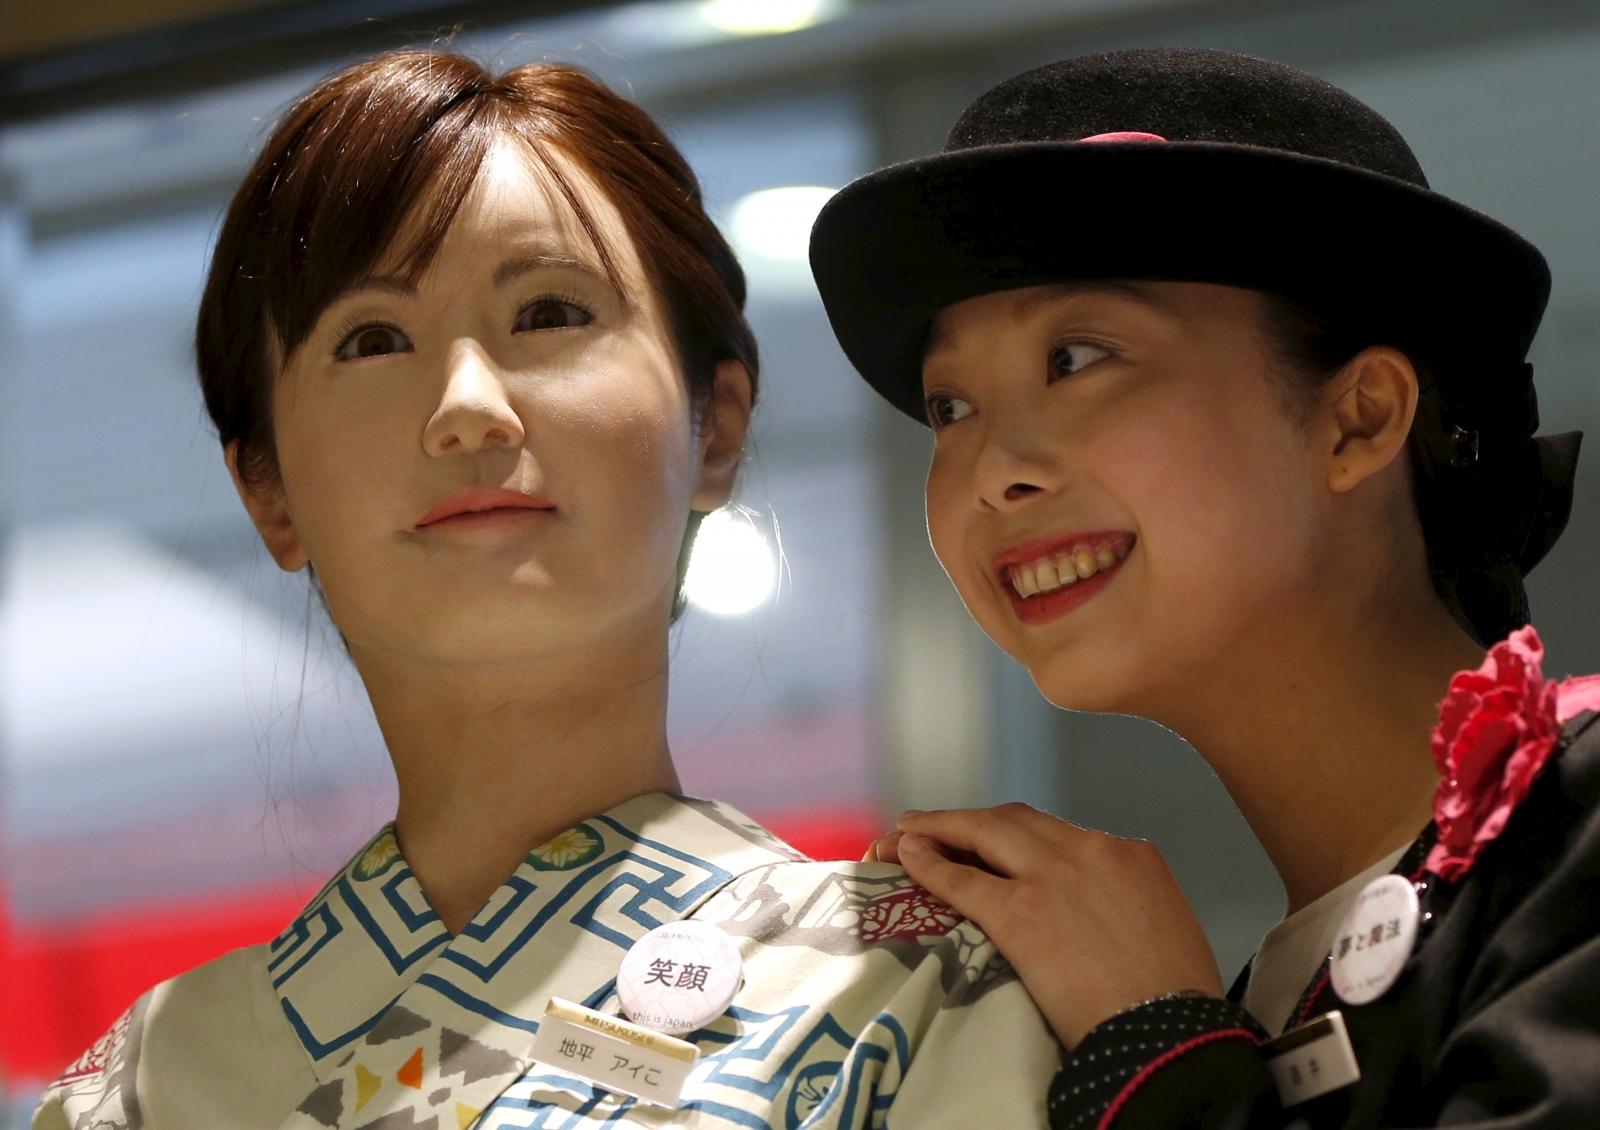 ChihiraAiko versus a real human woman